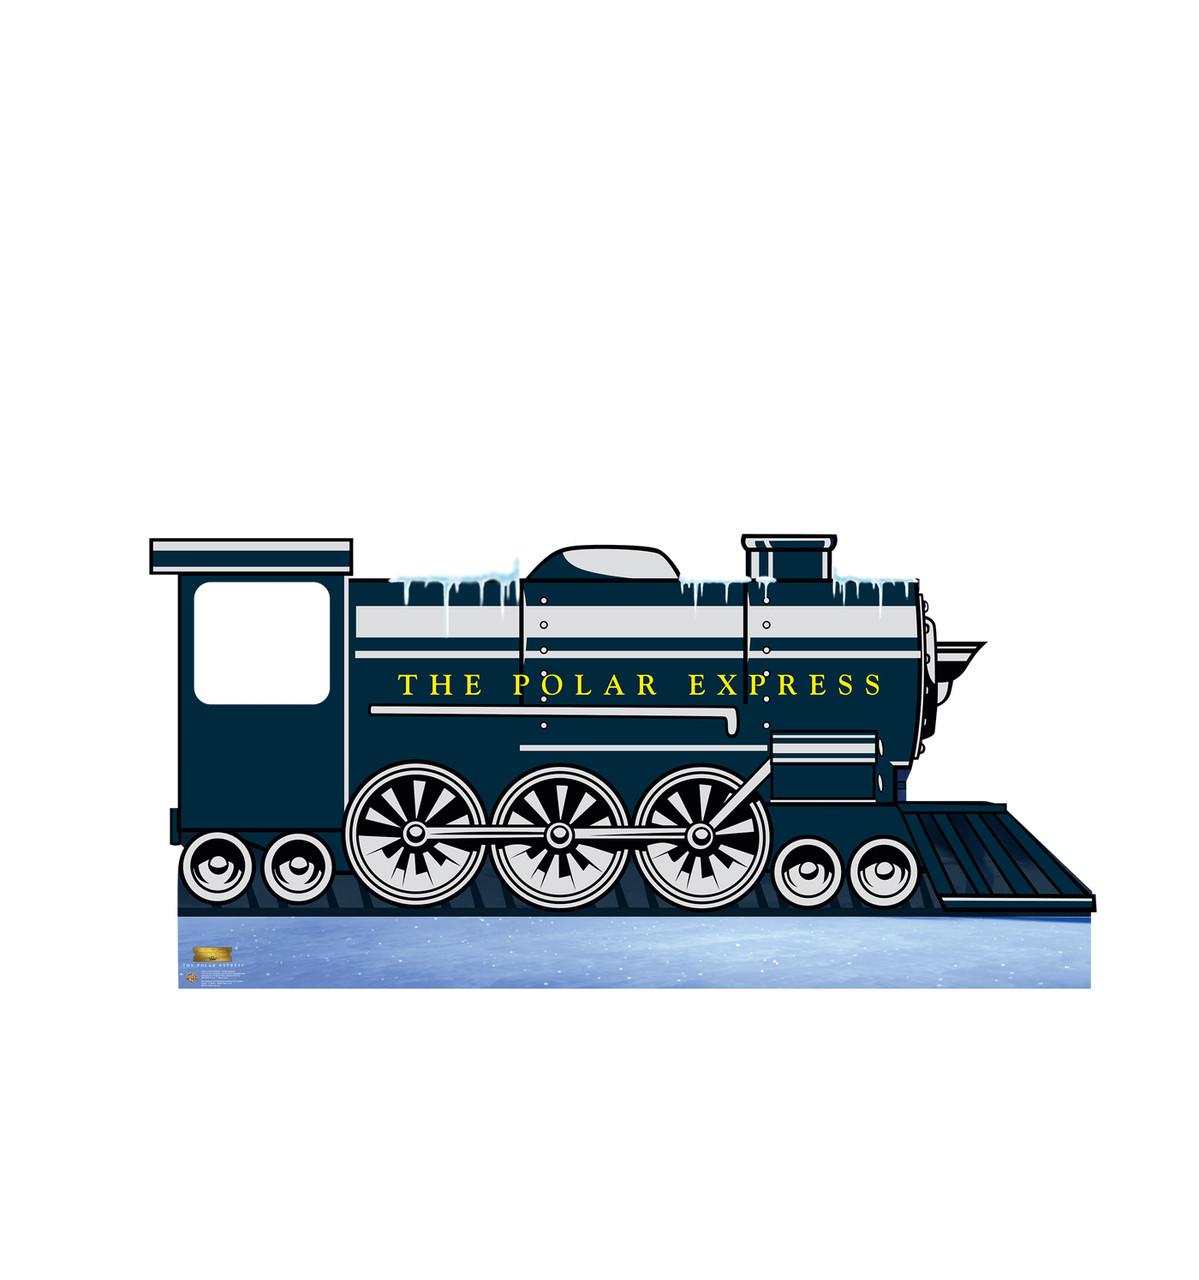 Life-size cardboard standee of the Polar Express Train Stand-in from The Polar Express.